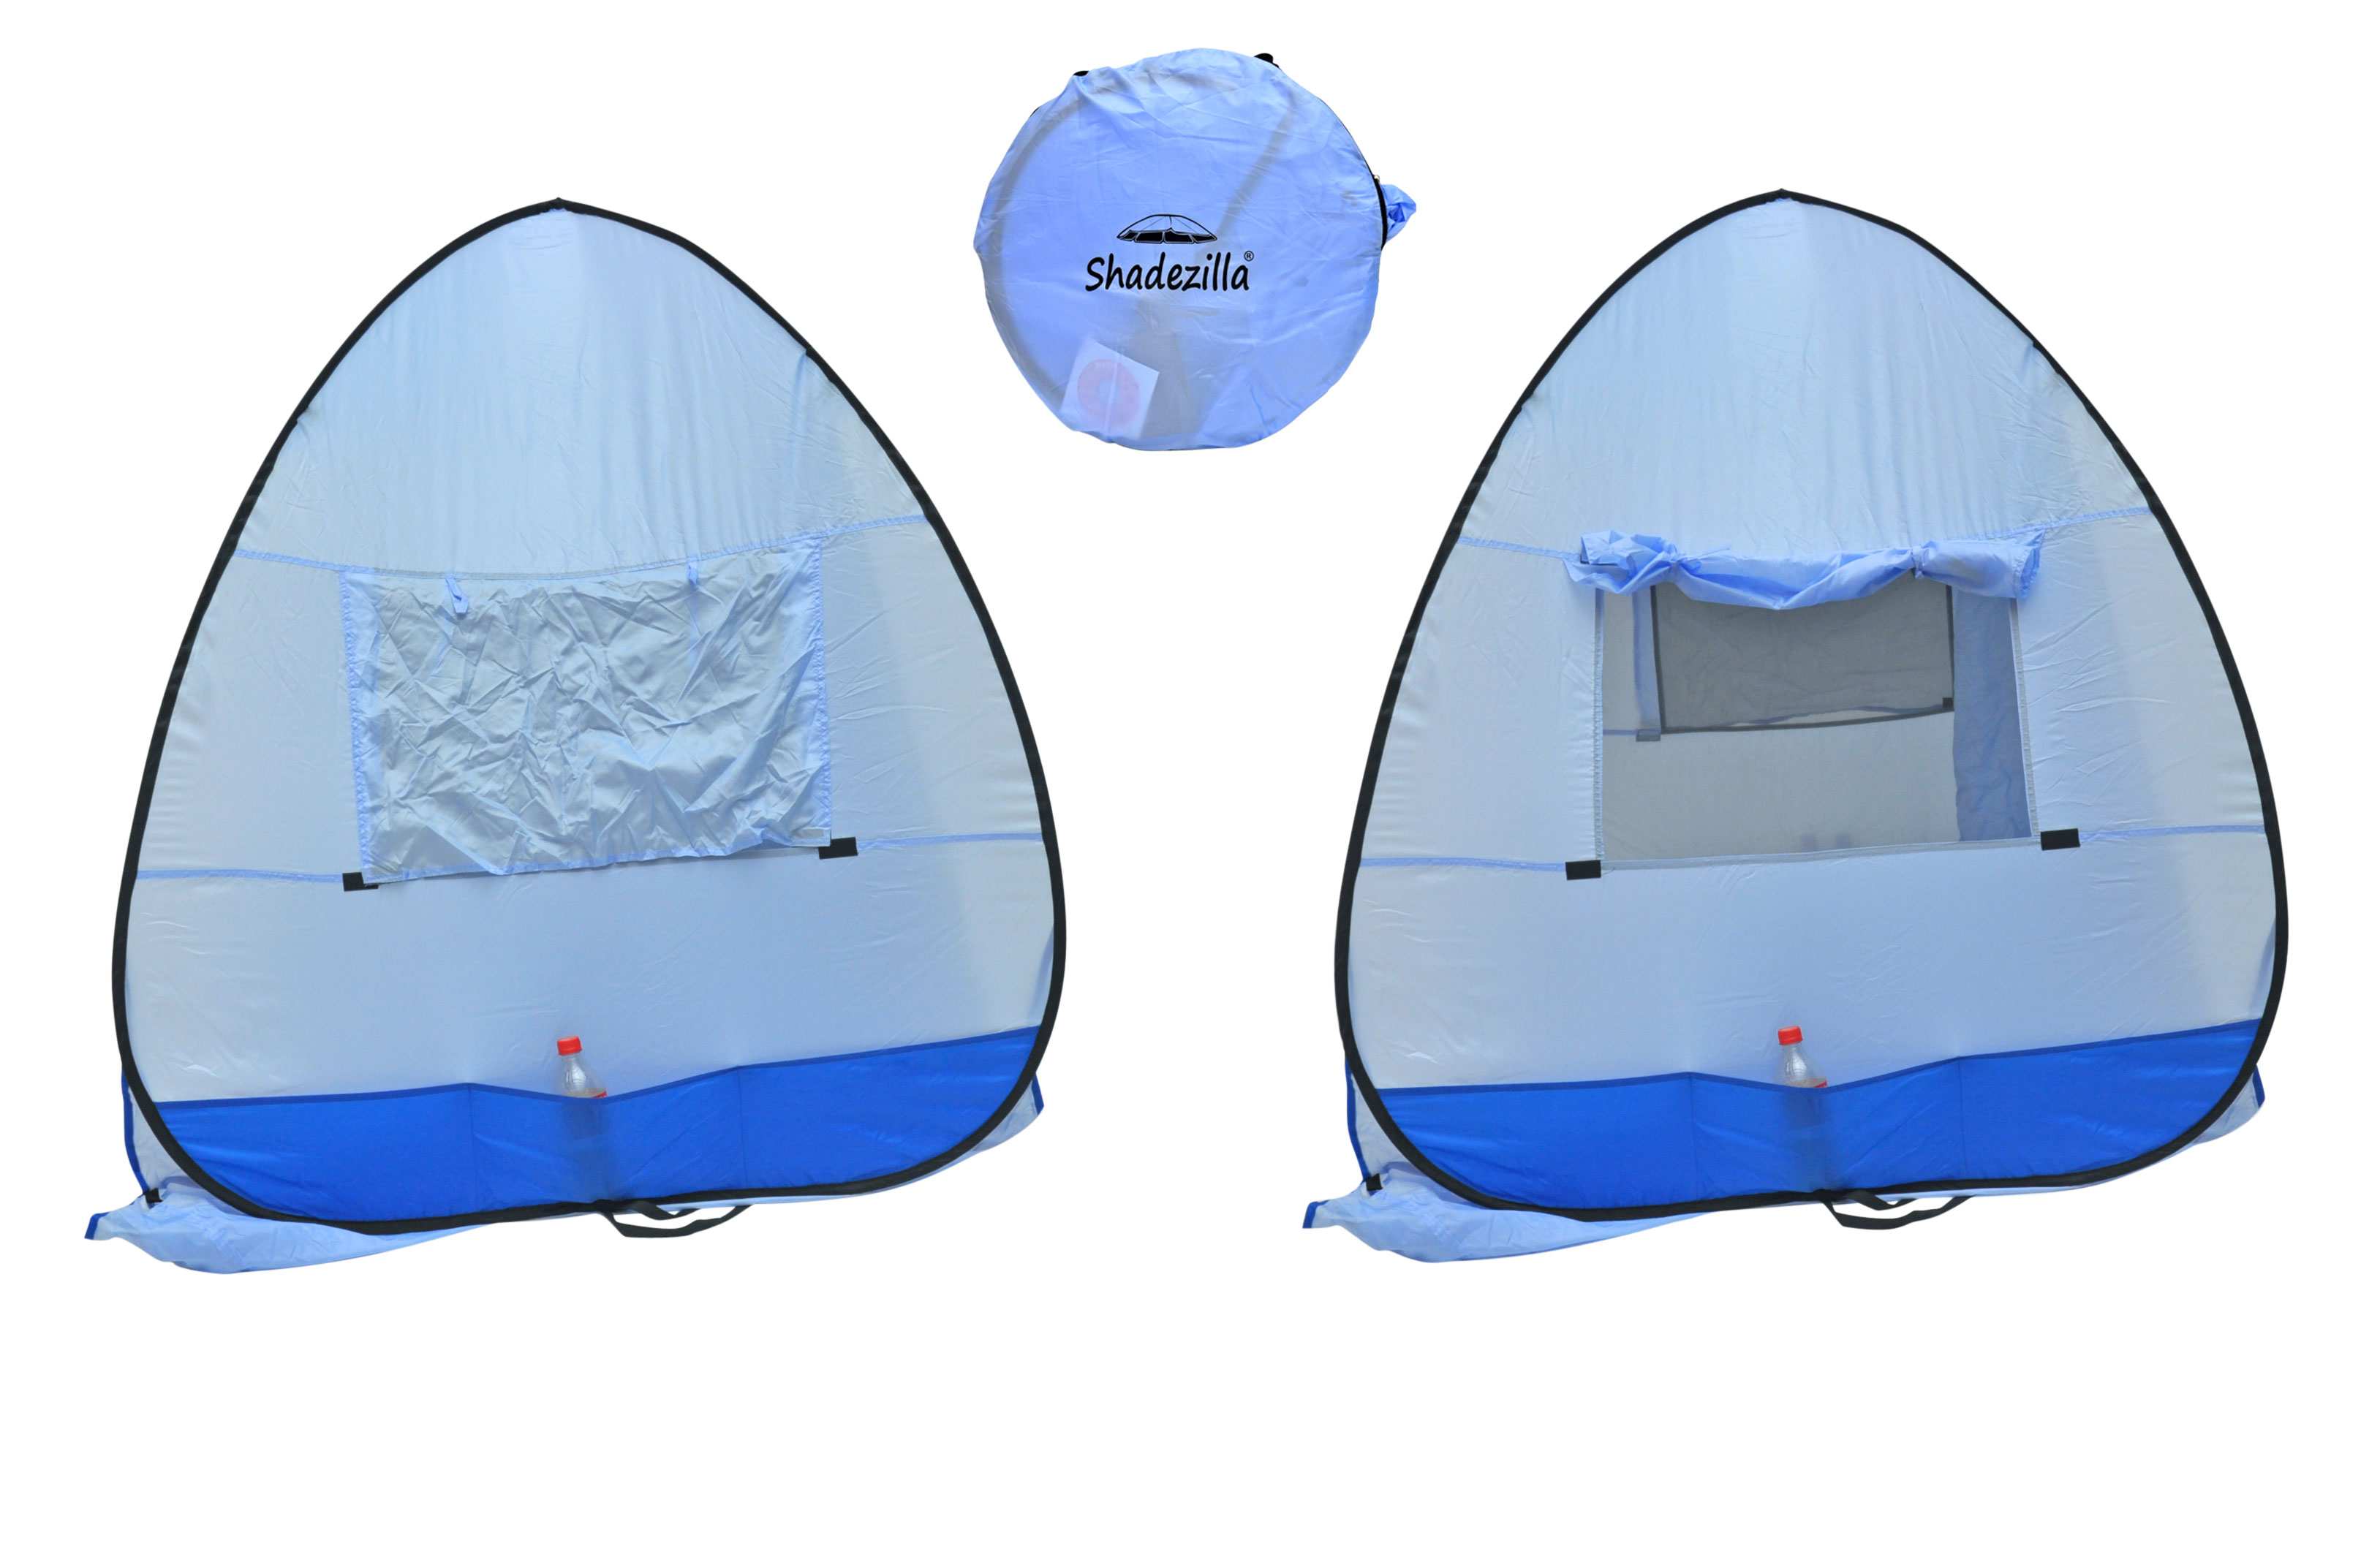 Instant-Pop-up-Family-Beach-Tent-Cabana-Shade-and-Sun-Shelter-UPF-55 thumbnail 7